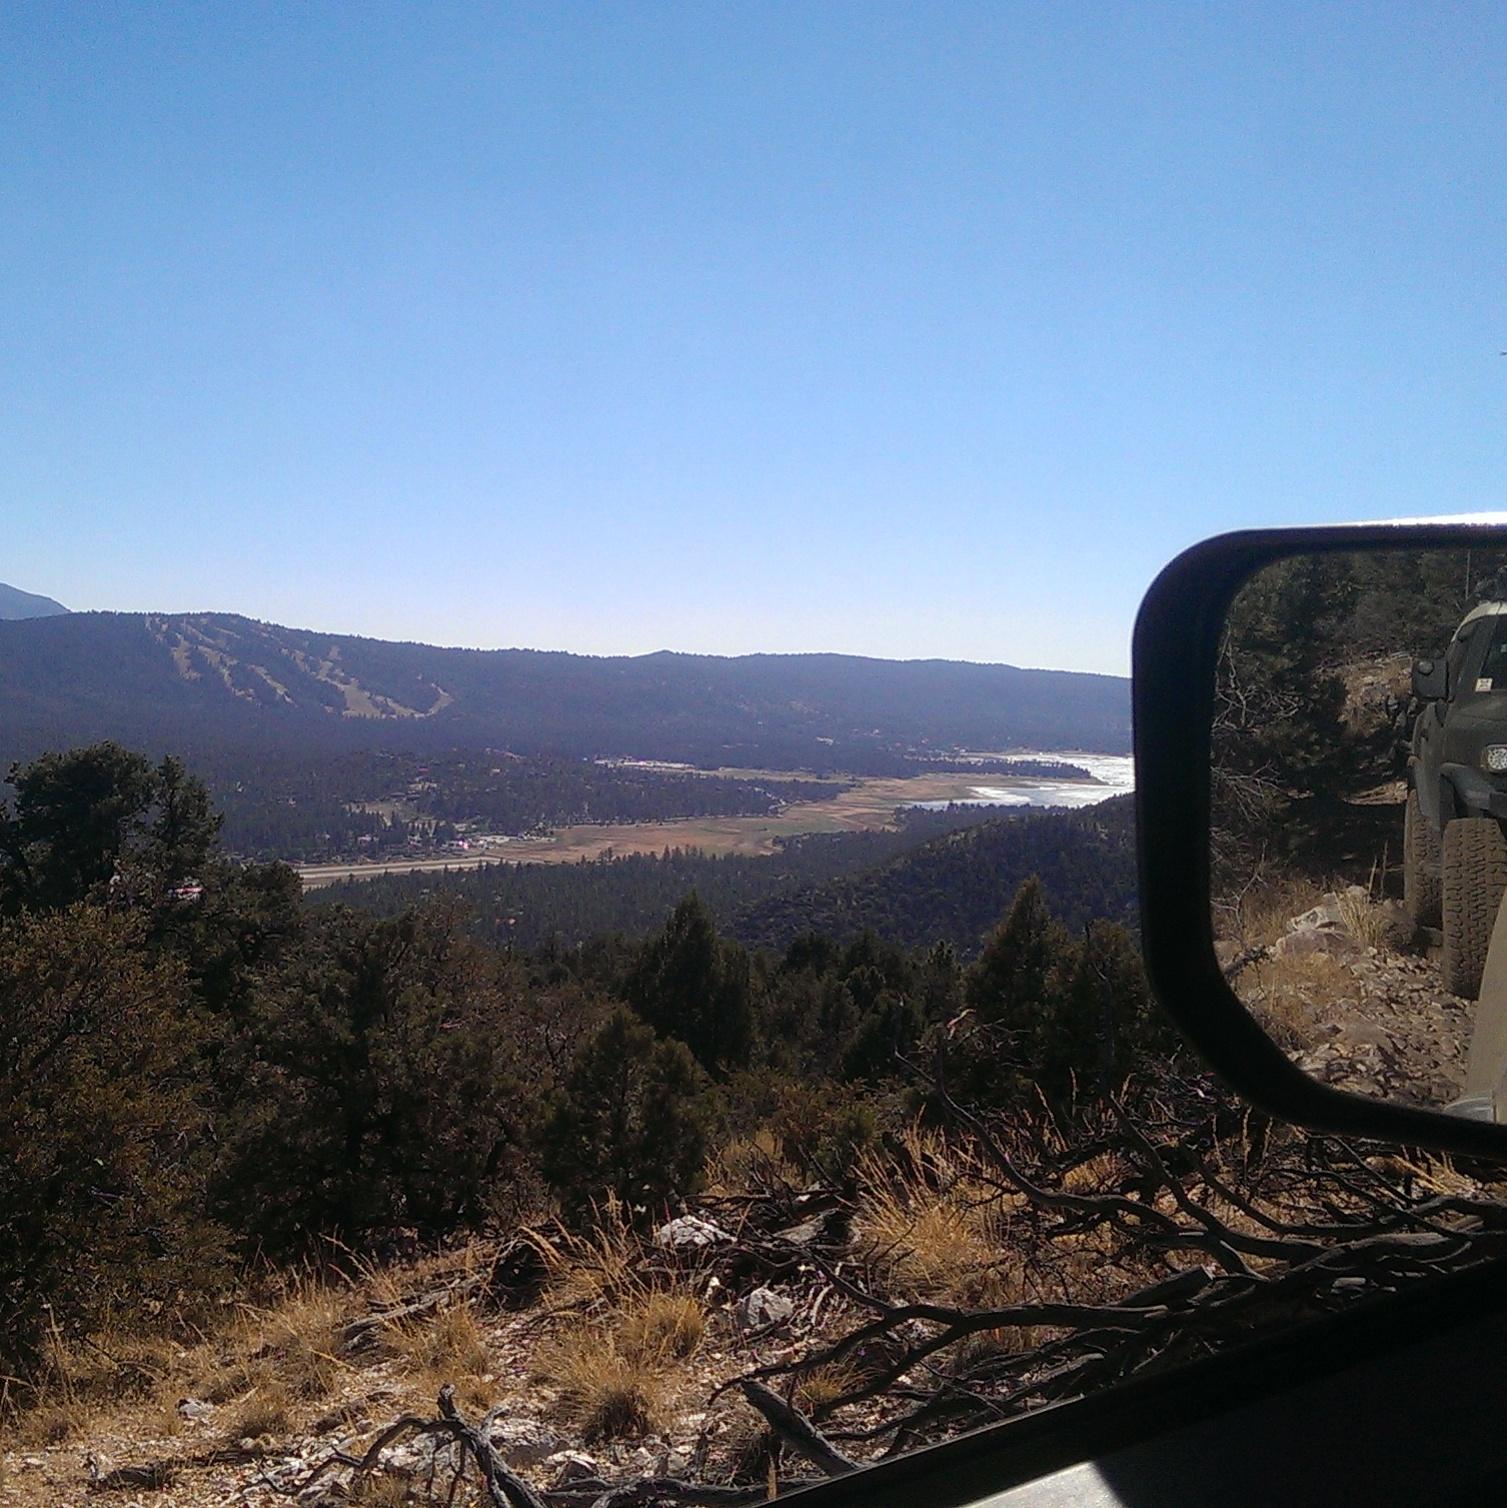 Toyota Of Oxnard >> Big Bear Overland Camping Locations? - Toyota FJ Cruiser Forum